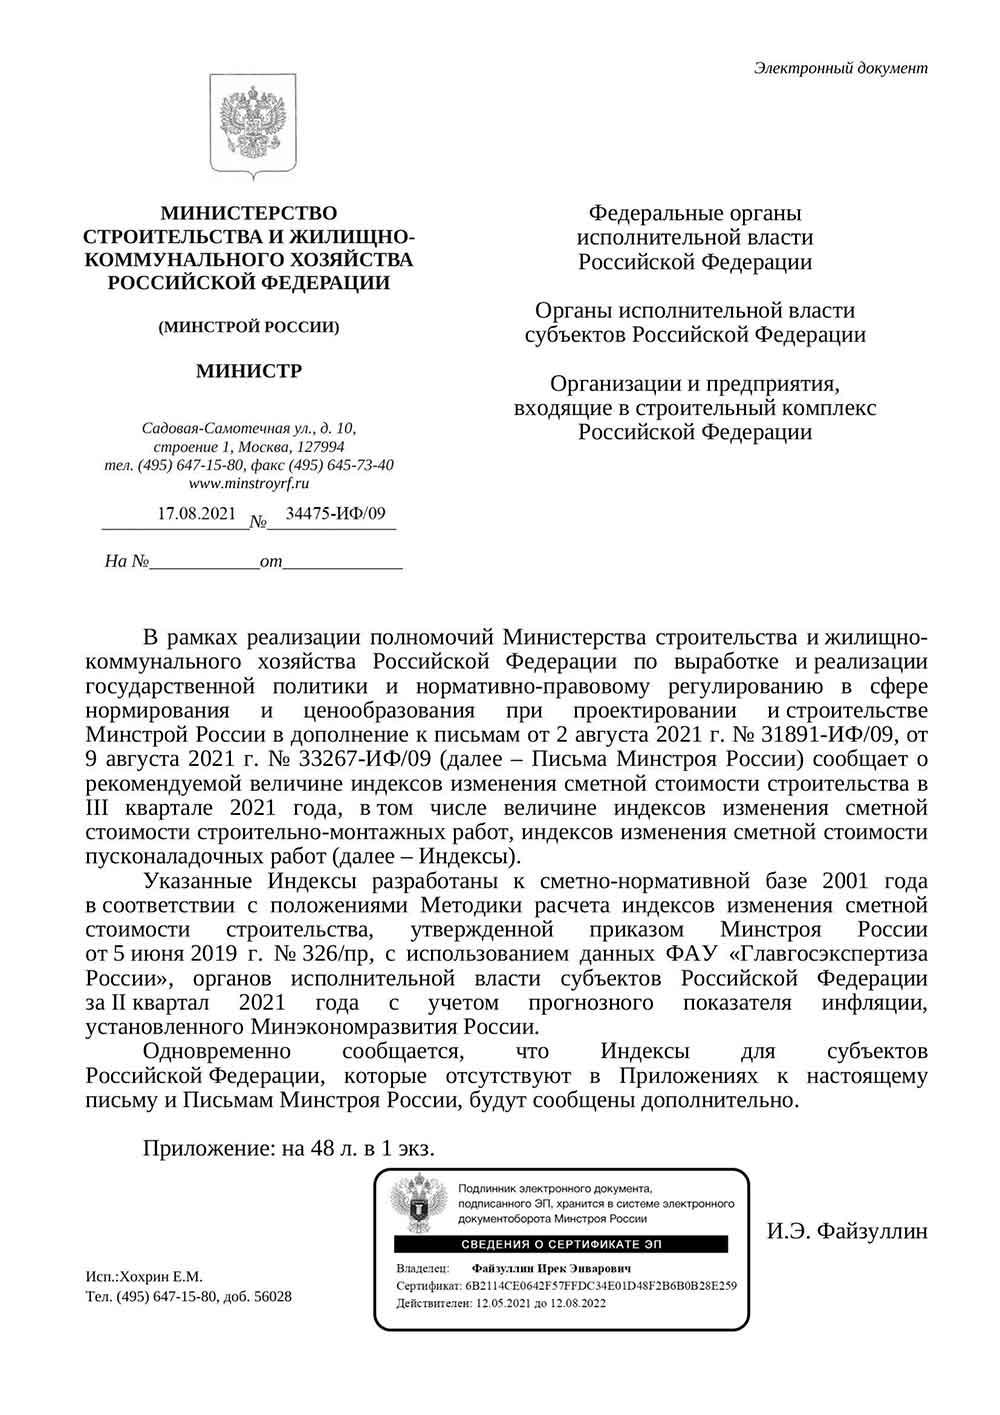 Письмо Минстроя РФ №34475-ИФ/09 от 17.08.2021 г.